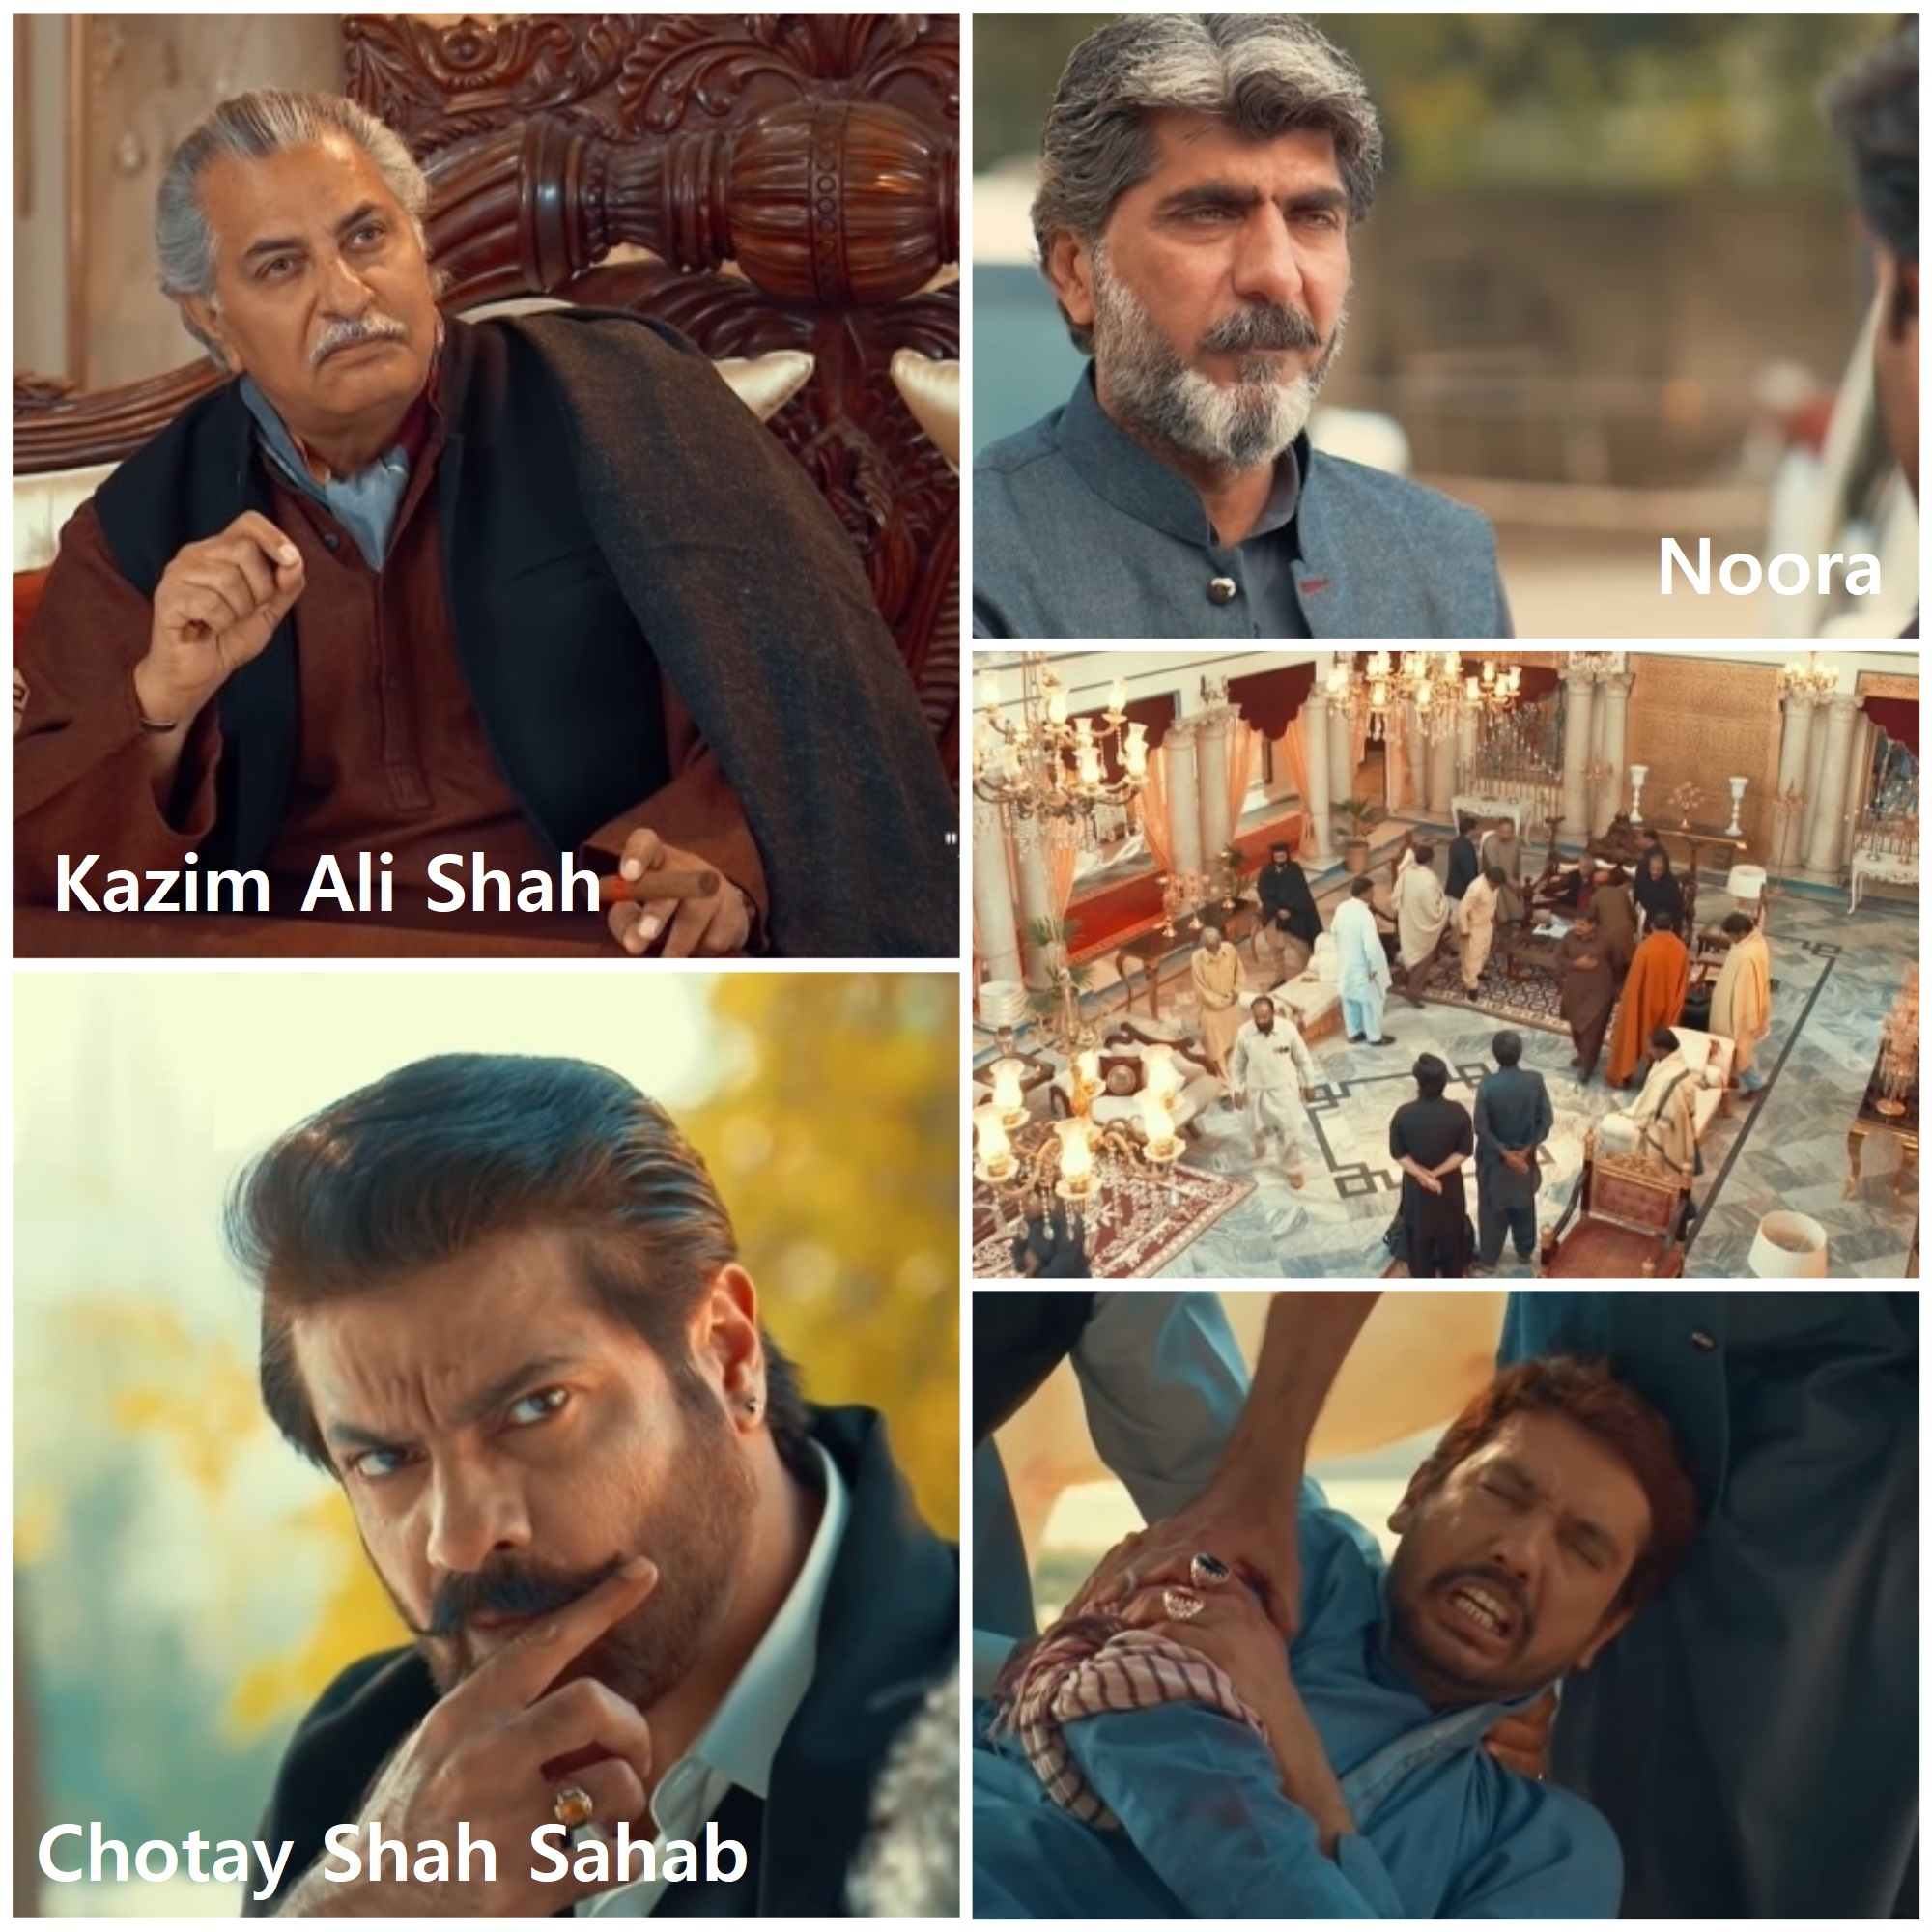 Khuda Aur Mohabbat 3 Episode 5 Story Review - Farhad's New Journey